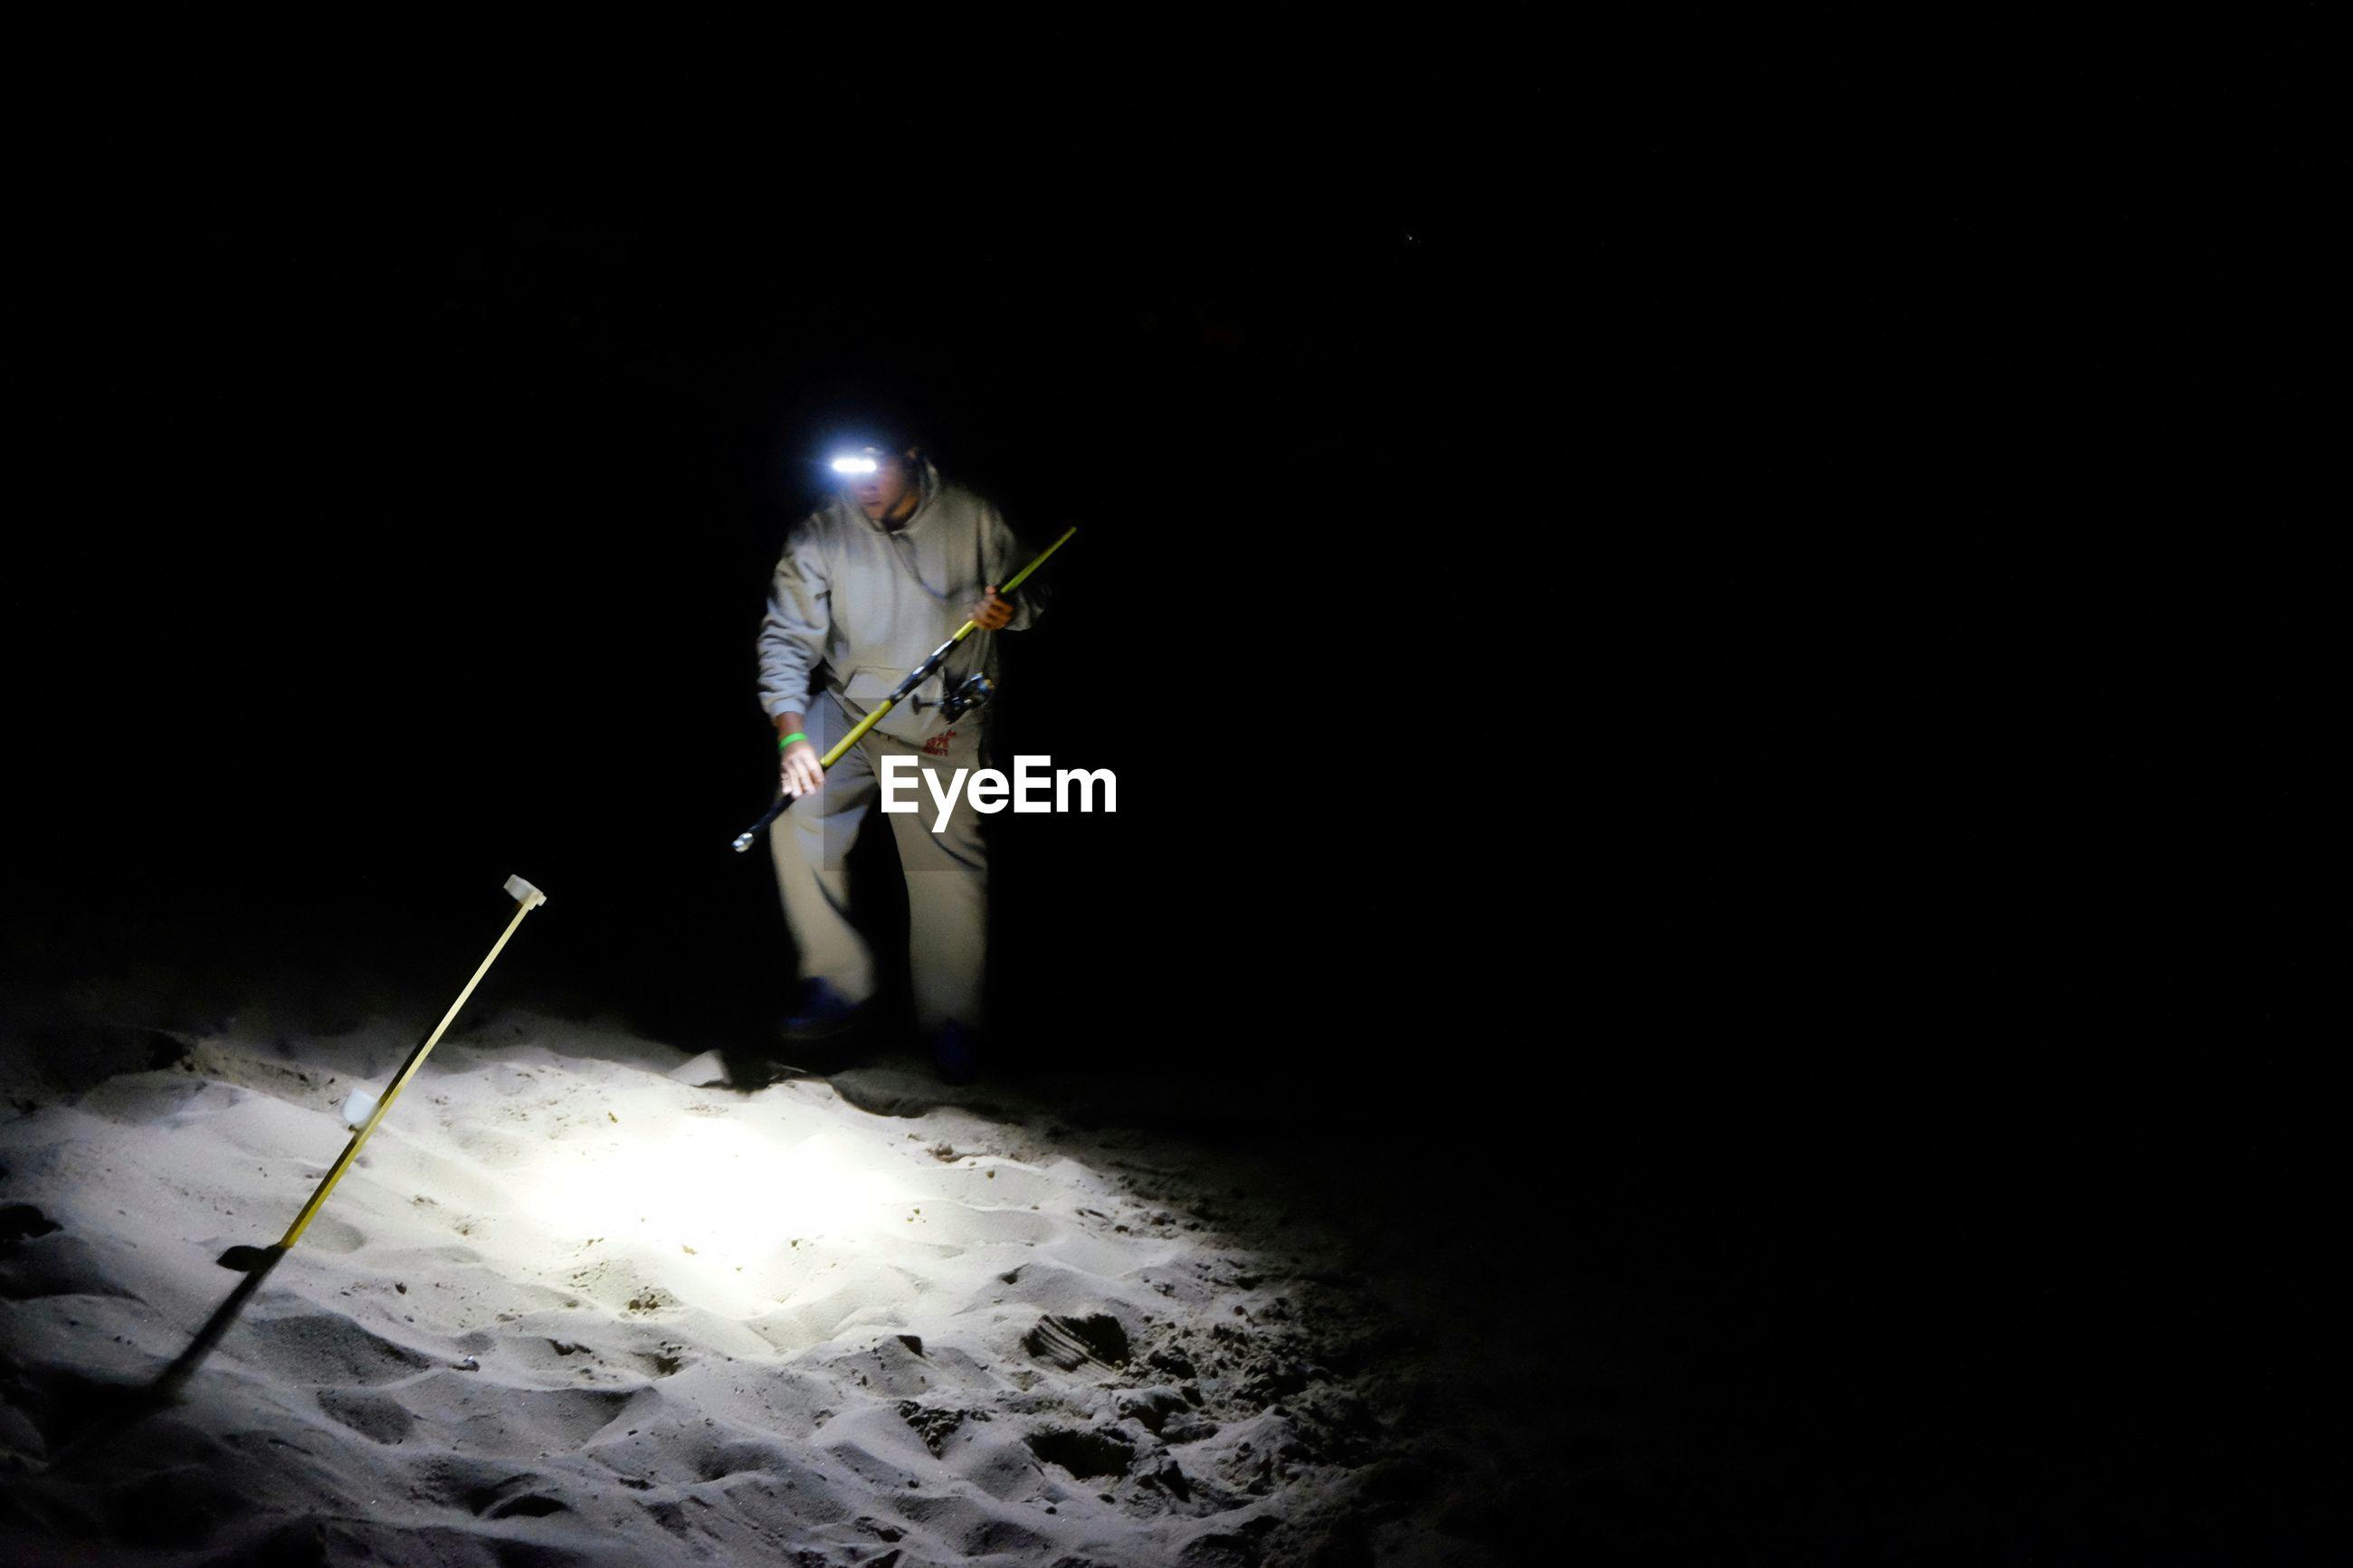 MAN HOLDING UMBRELLA WITH ILLUMINATED LIGHT